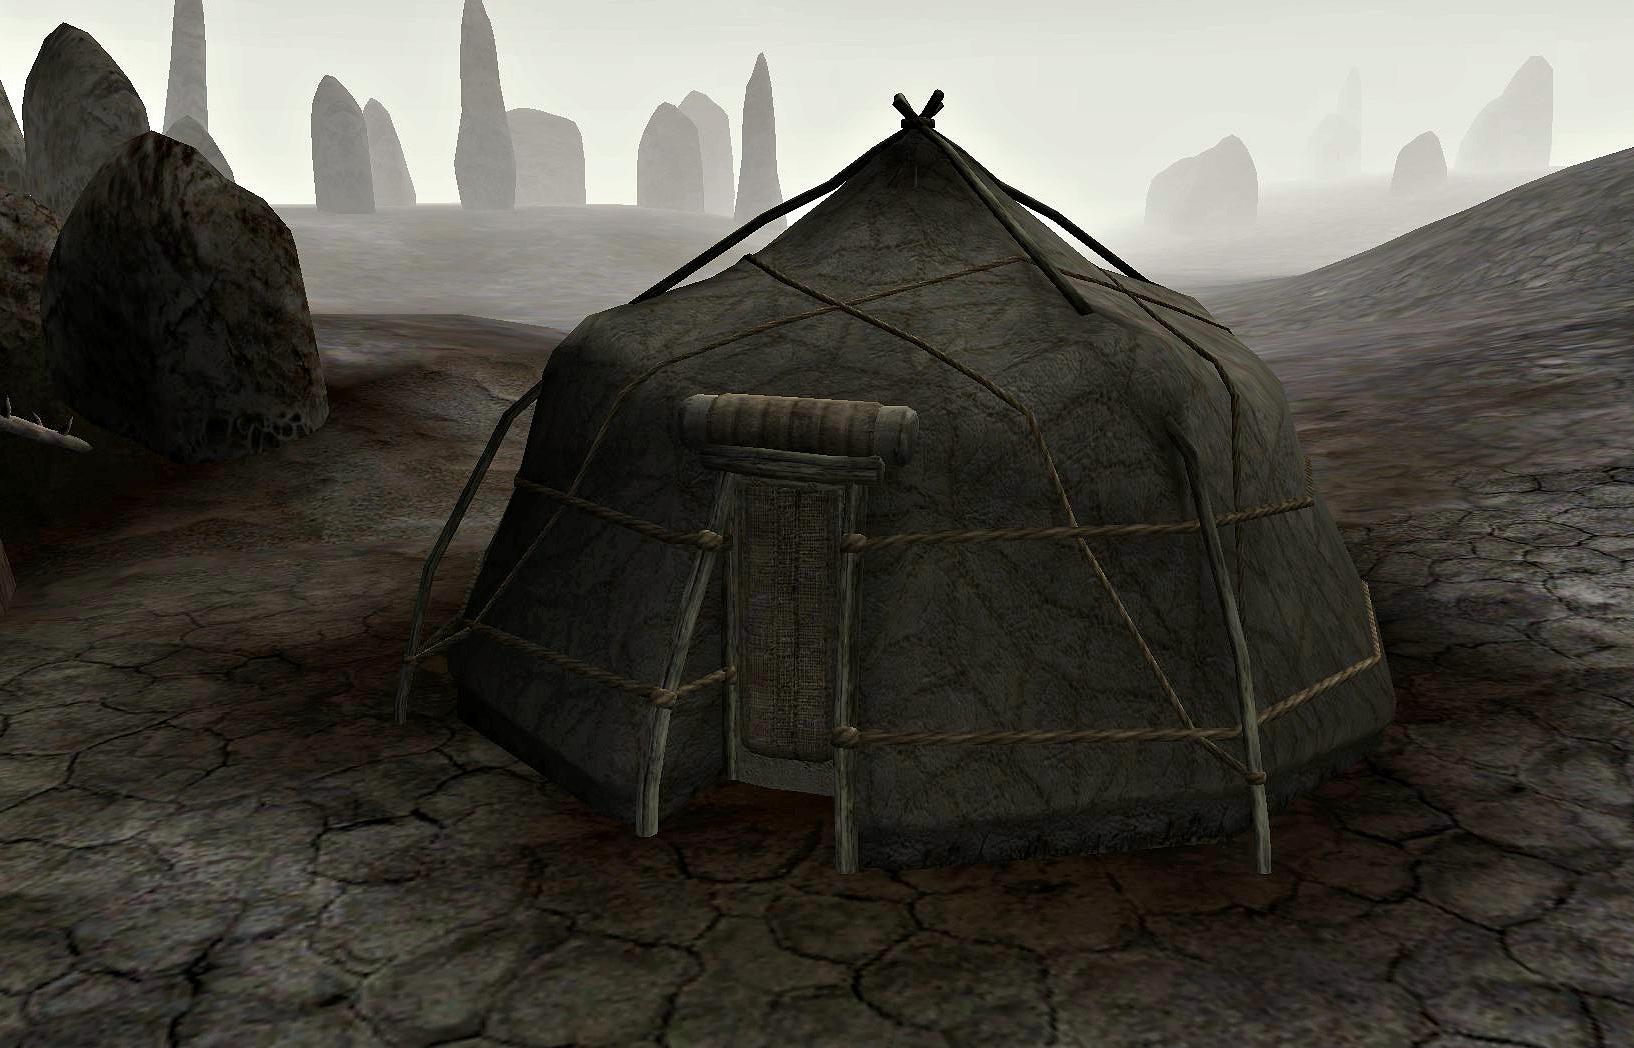 Sakiran's Yurt